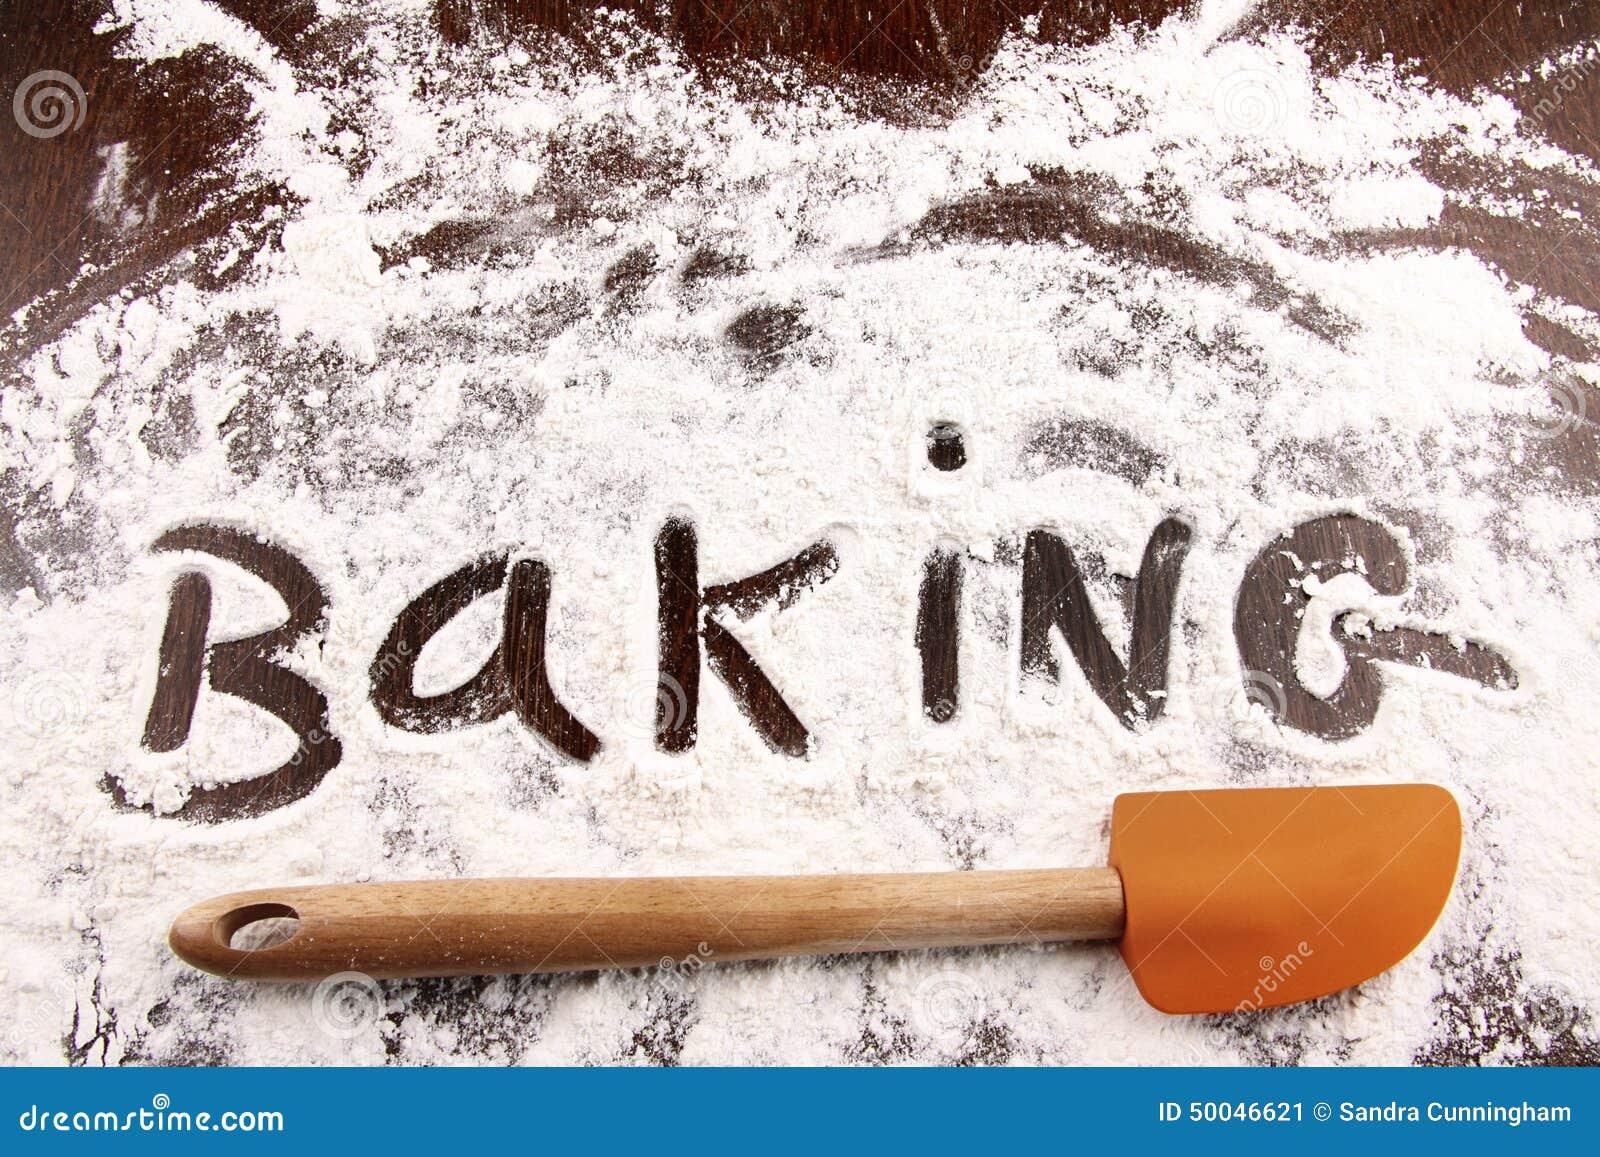 word baking written in white flour on wooden table stock